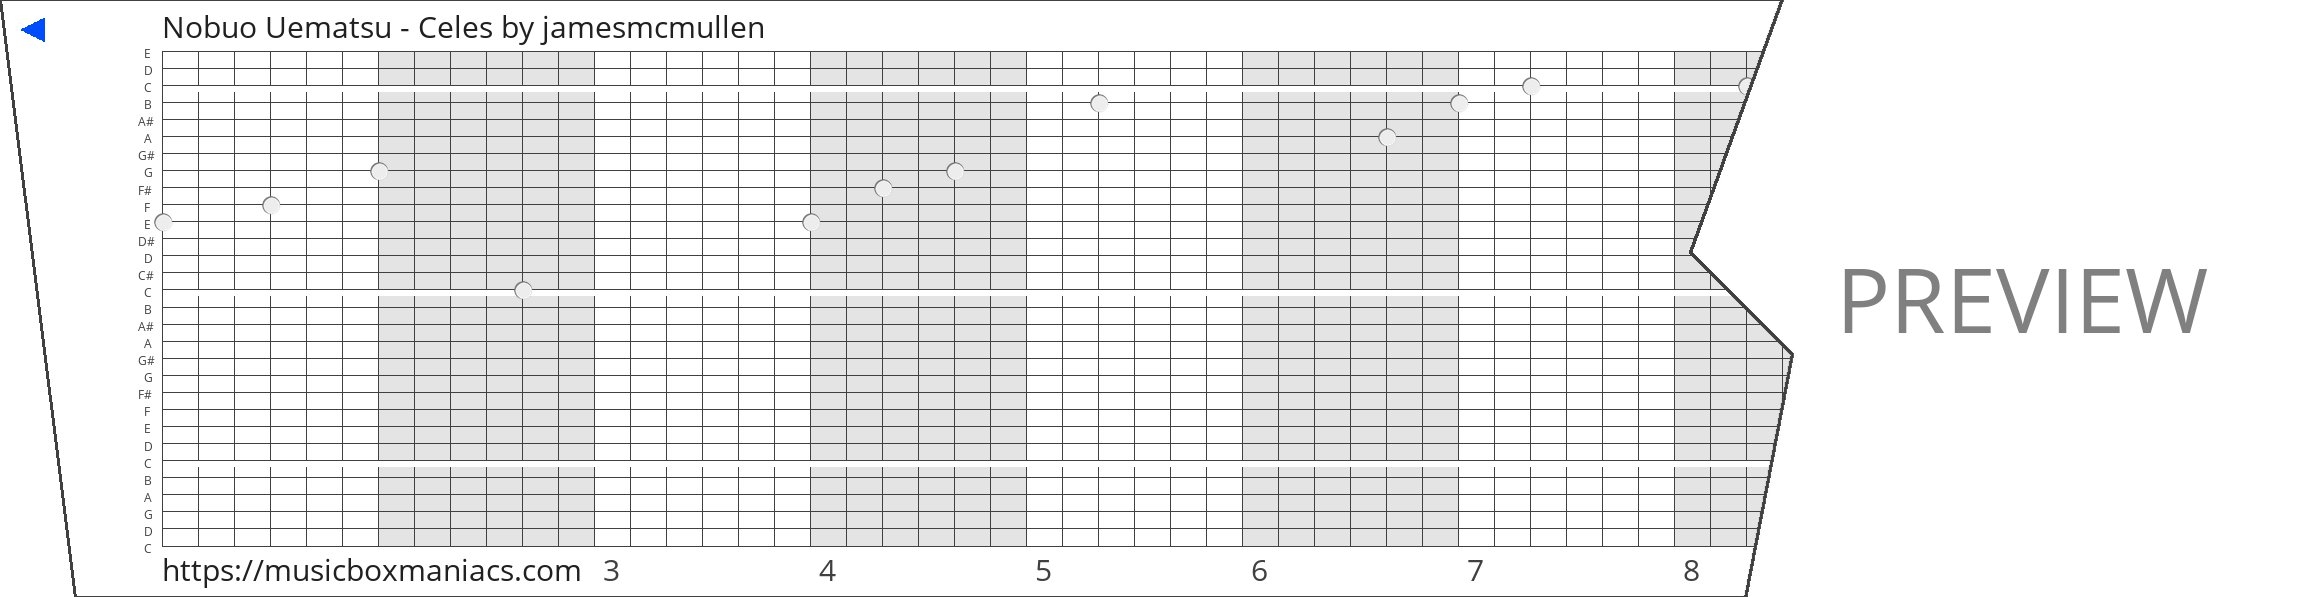 Nobuo Uematsu - Celes 30 note music box paper strip